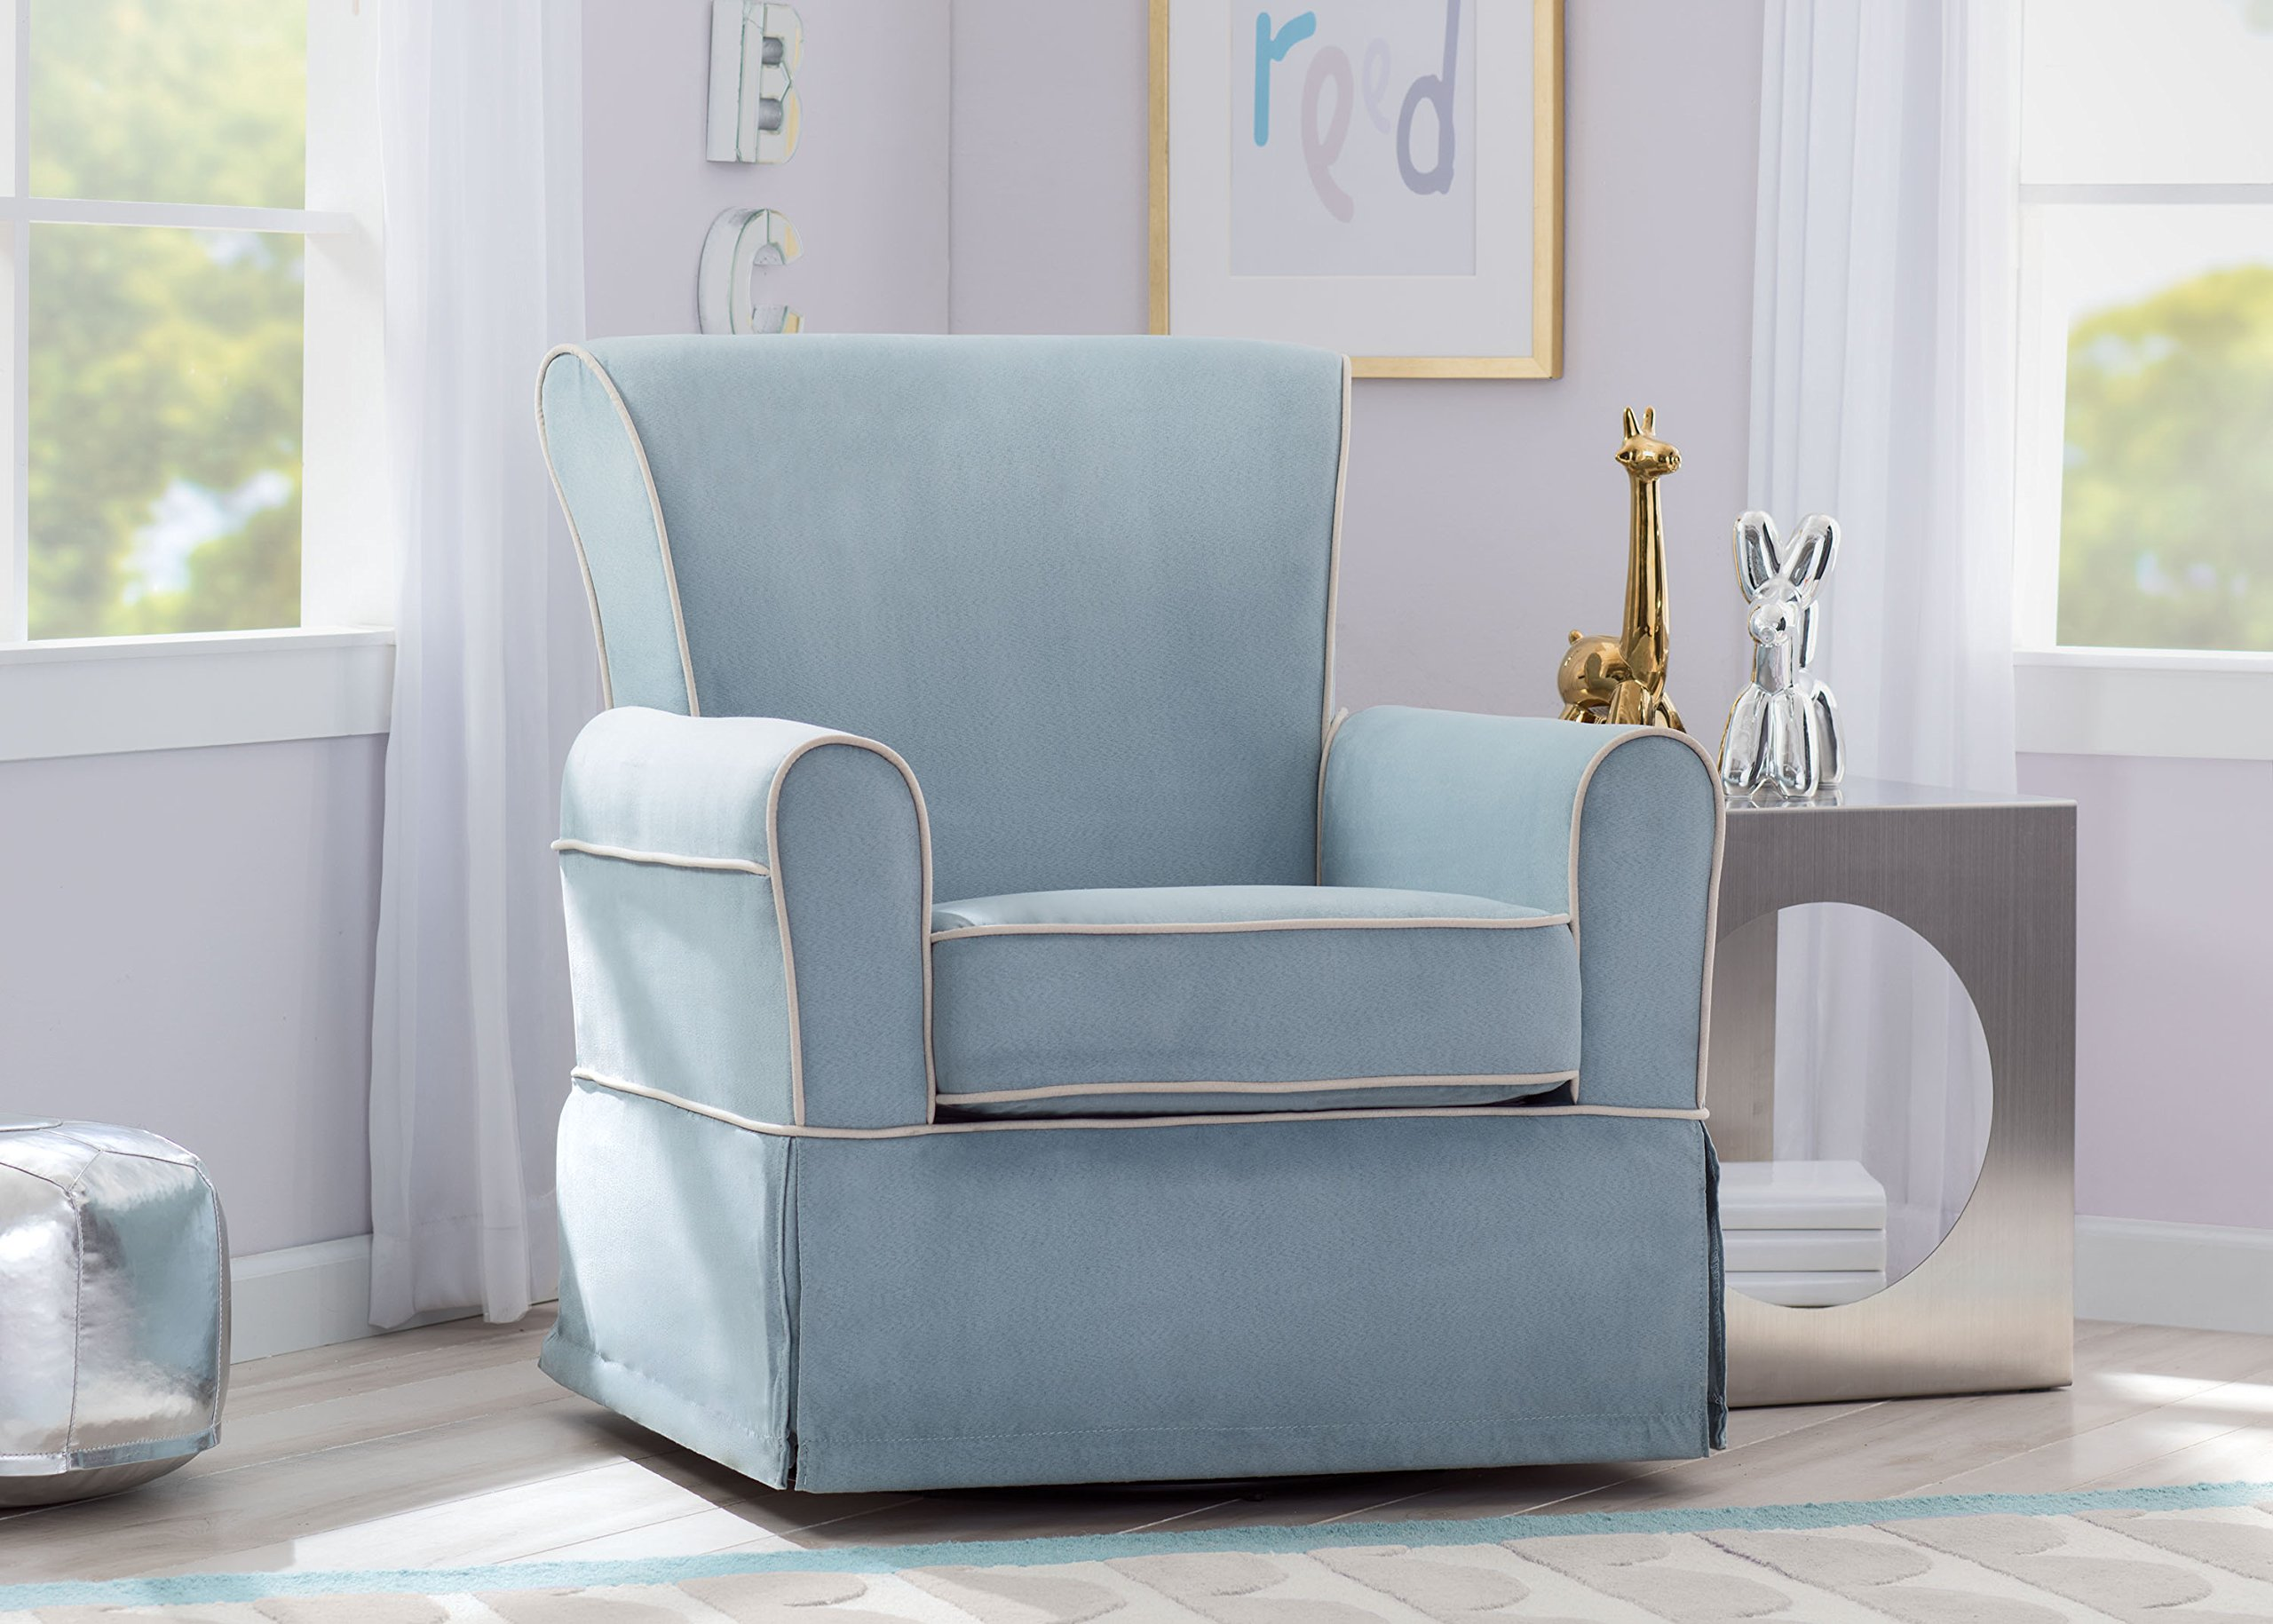 Delta Furniture Benbridge Upholstered Glider Swivel Rocker Chair, Frozen Blue with Cream Welt by Delta Furniture (Image #5)